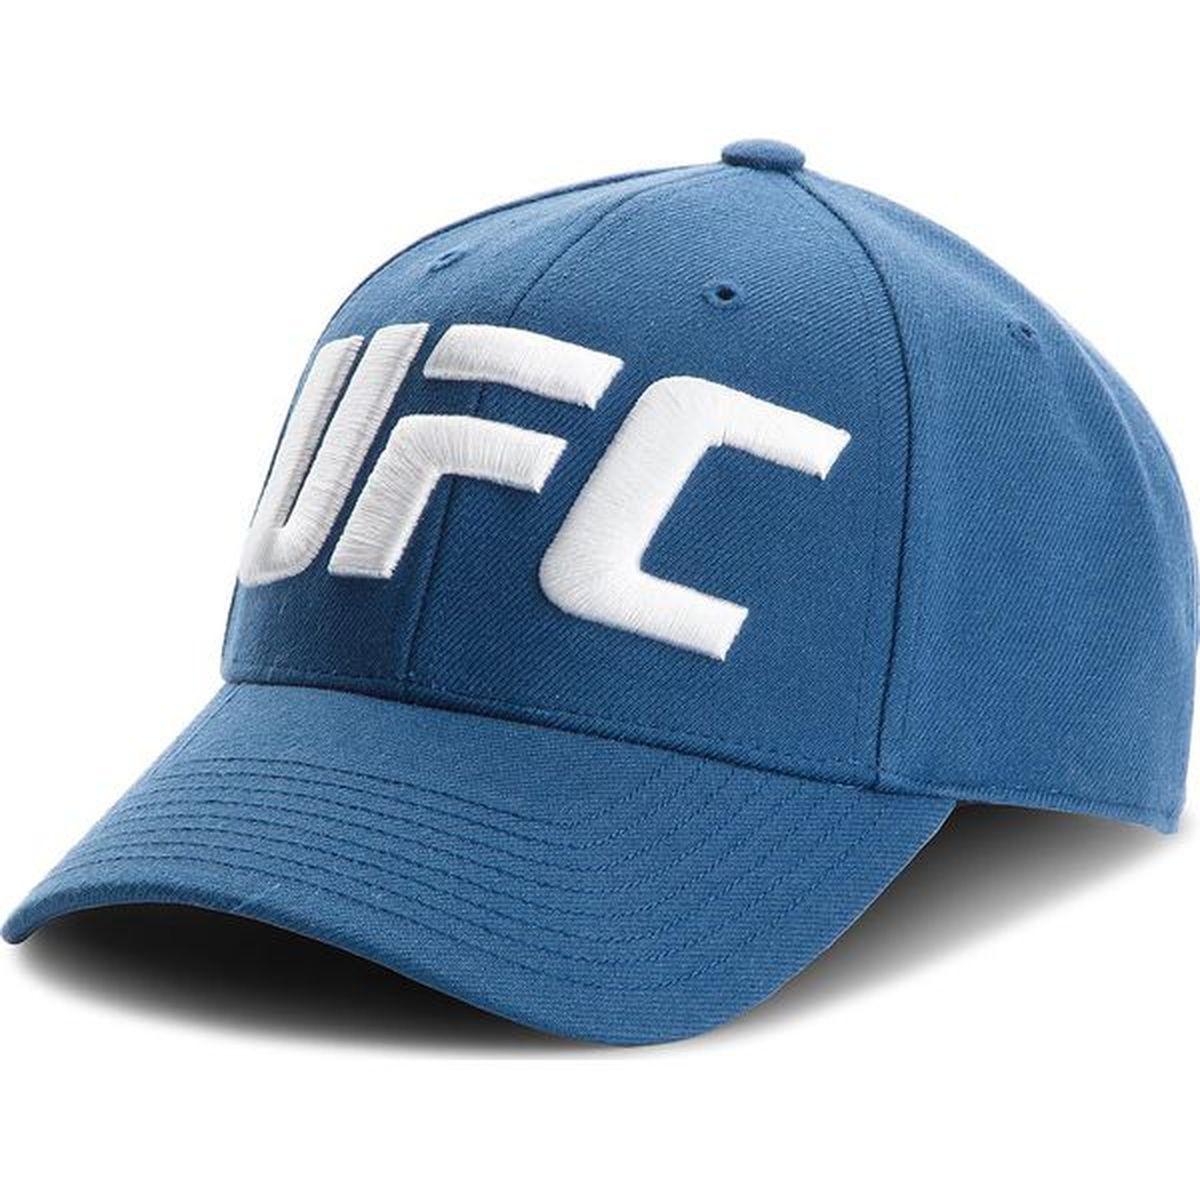 Бейсболка Reebok Ufc Baseball Cap (L stylish person embroidery black baseball cap for men